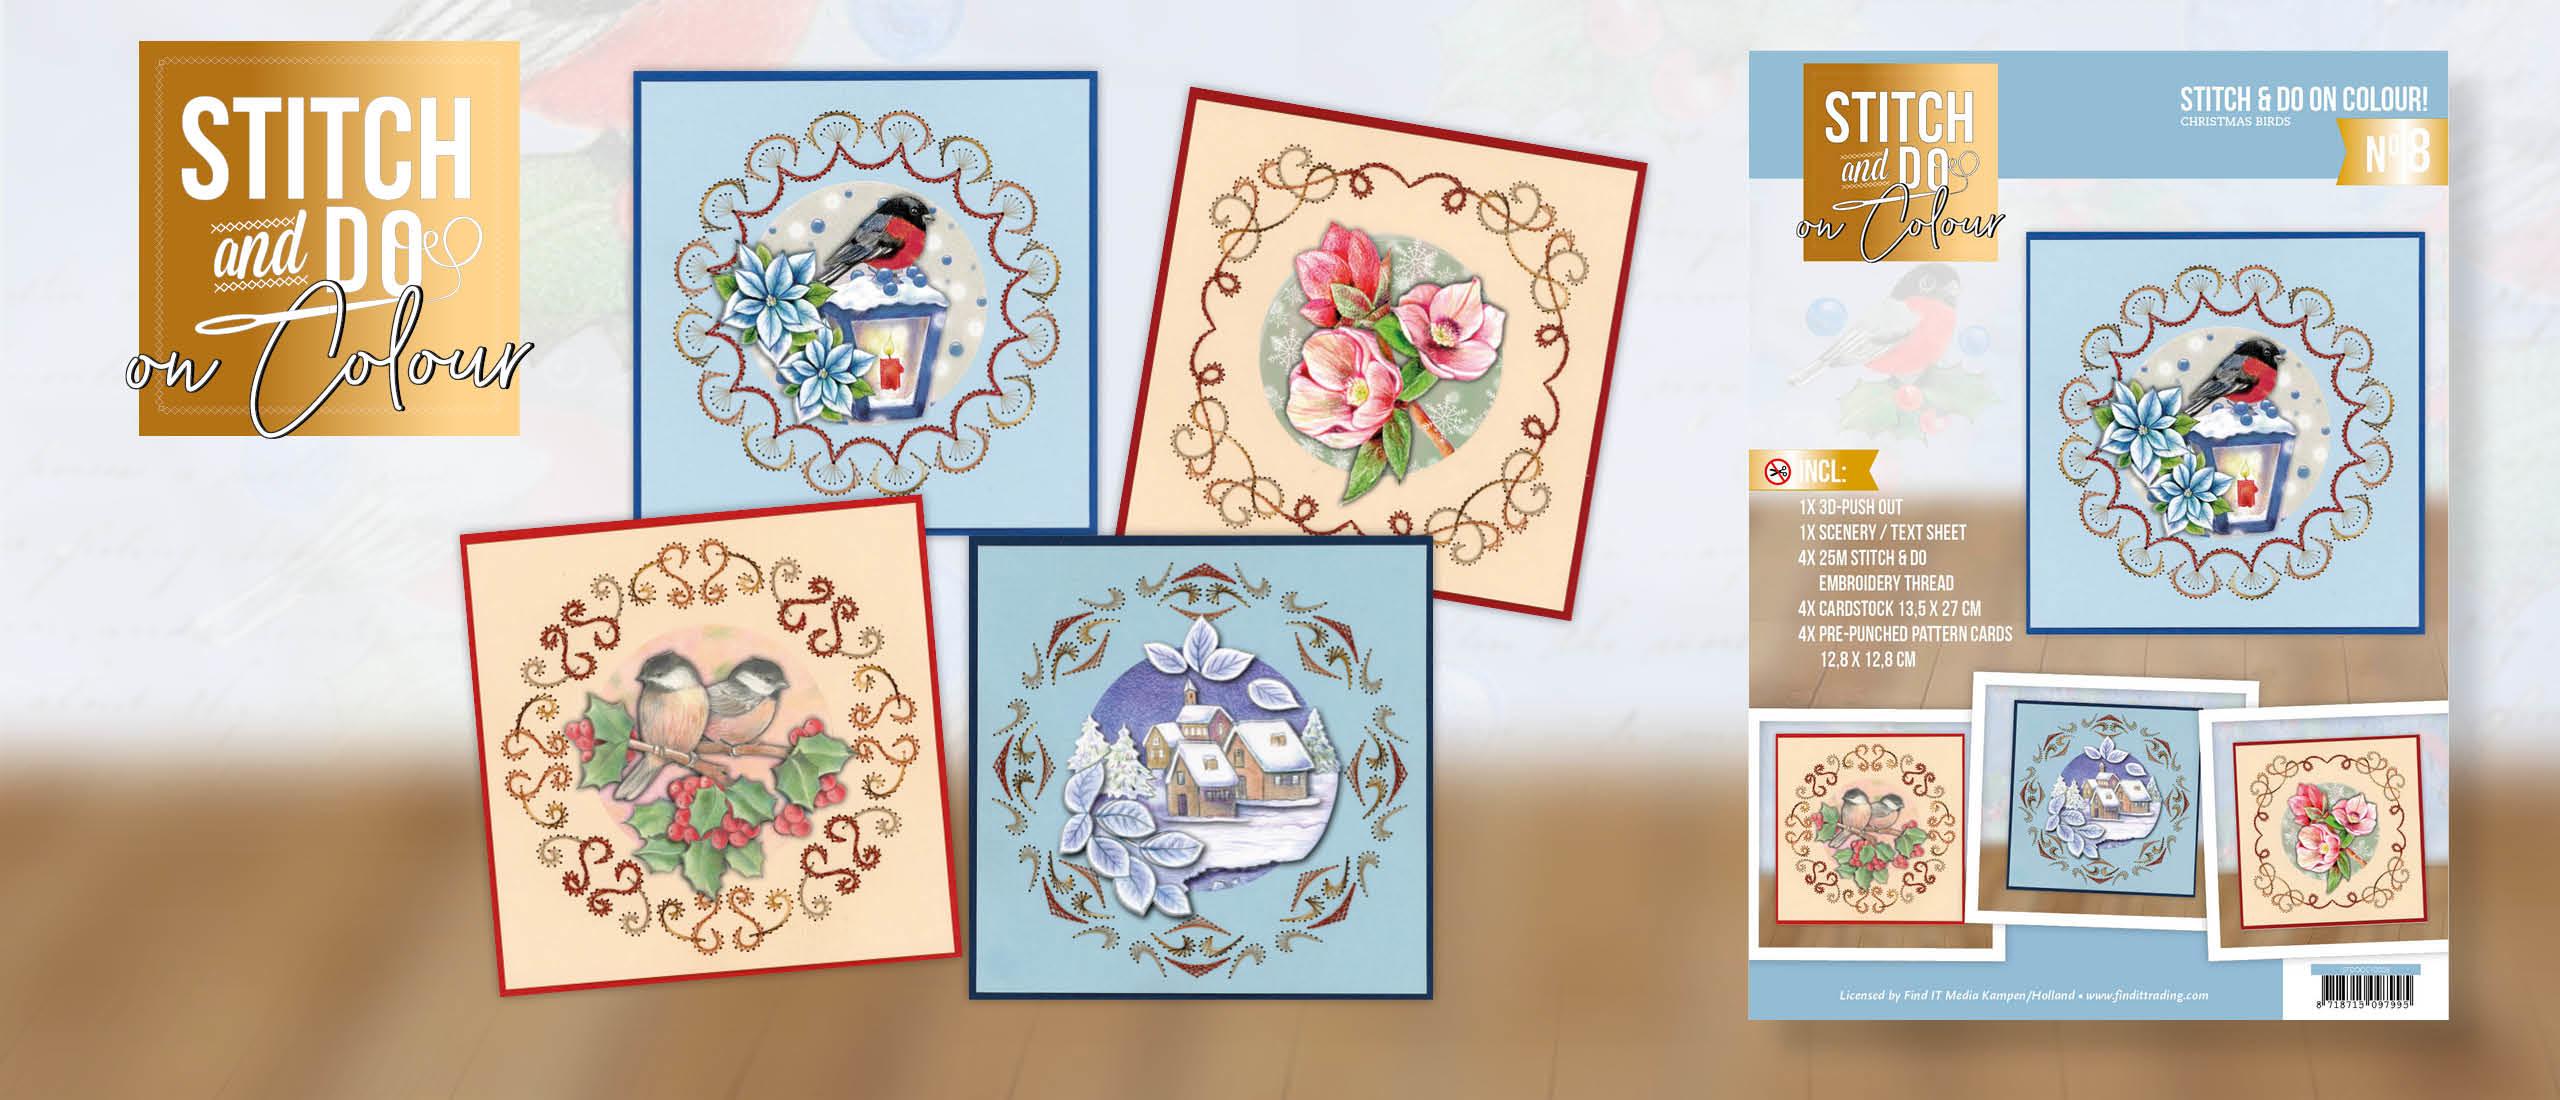 🆕 Stitch and Do on Colour 008 - Christmas Birds 🧵🐦